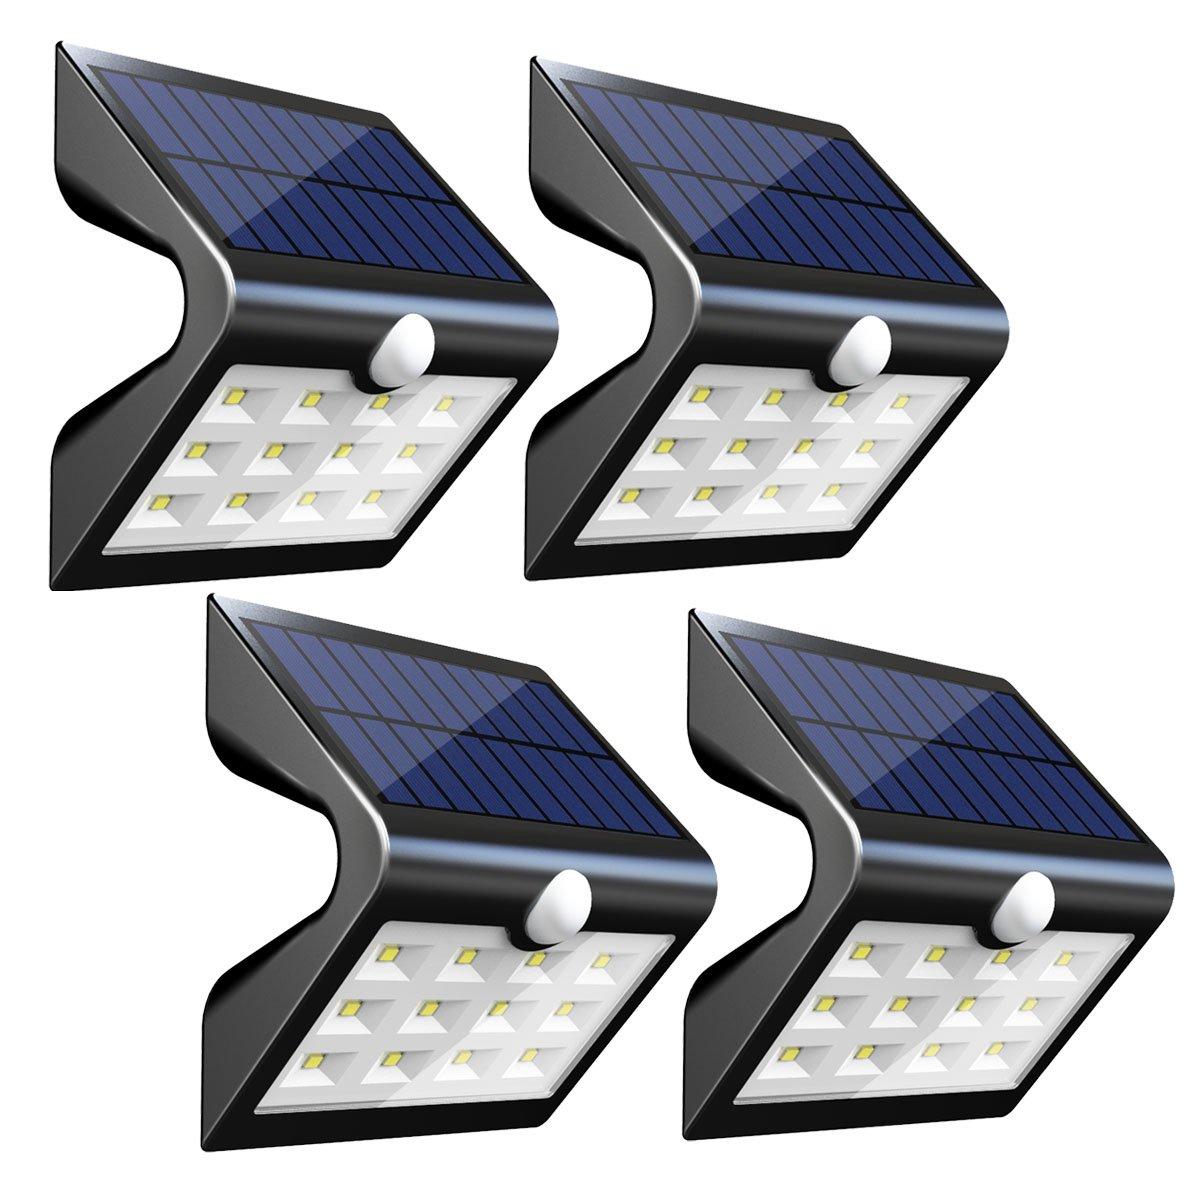 InnoGear Solar Powered Motionライト屋外ウォールマウントセキュリティライトステップライトパスパティオプールYardデッキPorchガーデンフェンス、2パック ブラック SL412 B06XRYCWH6 13863